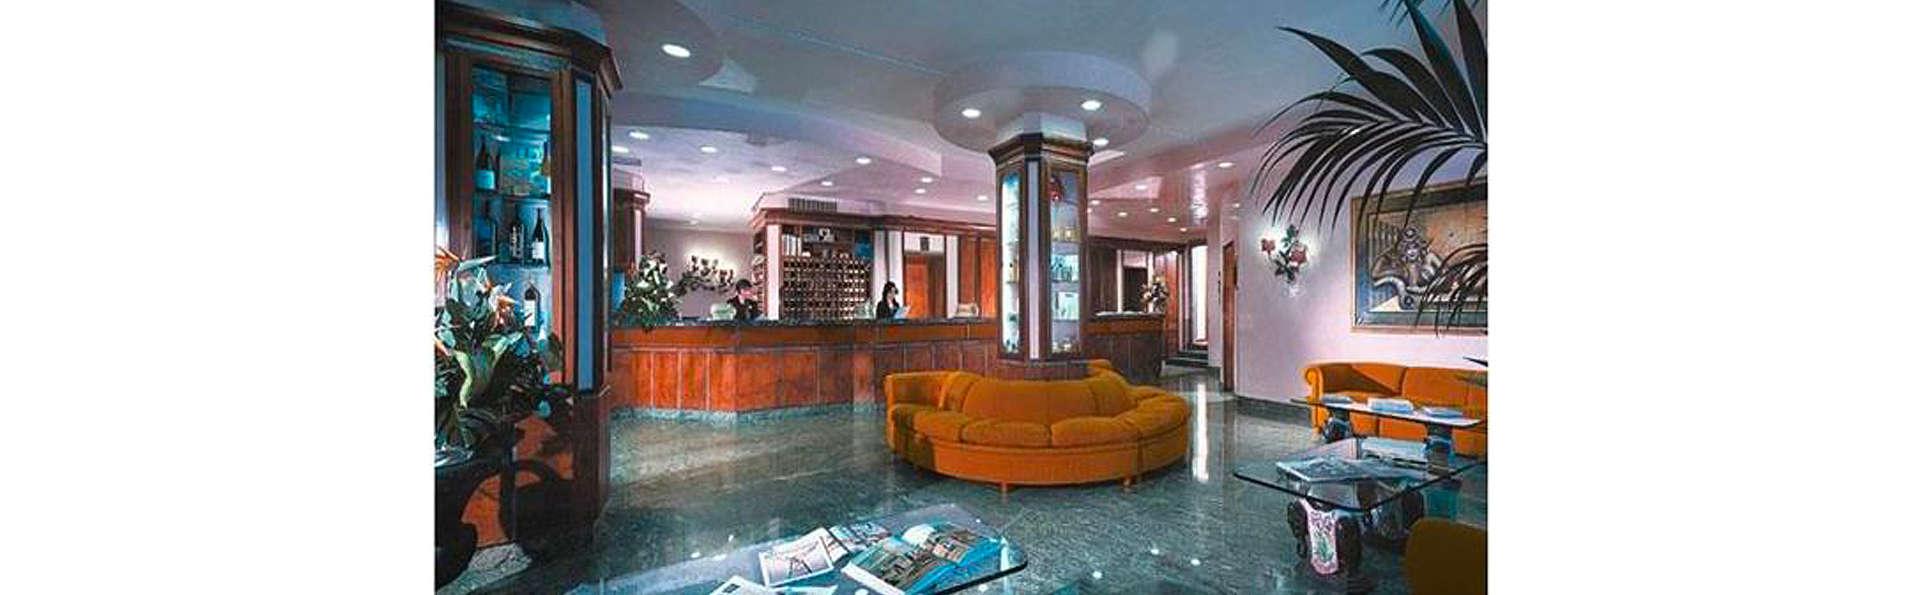 Best Western Grand Hotel Guinigi - EDIT_LOBBY_01.jpg